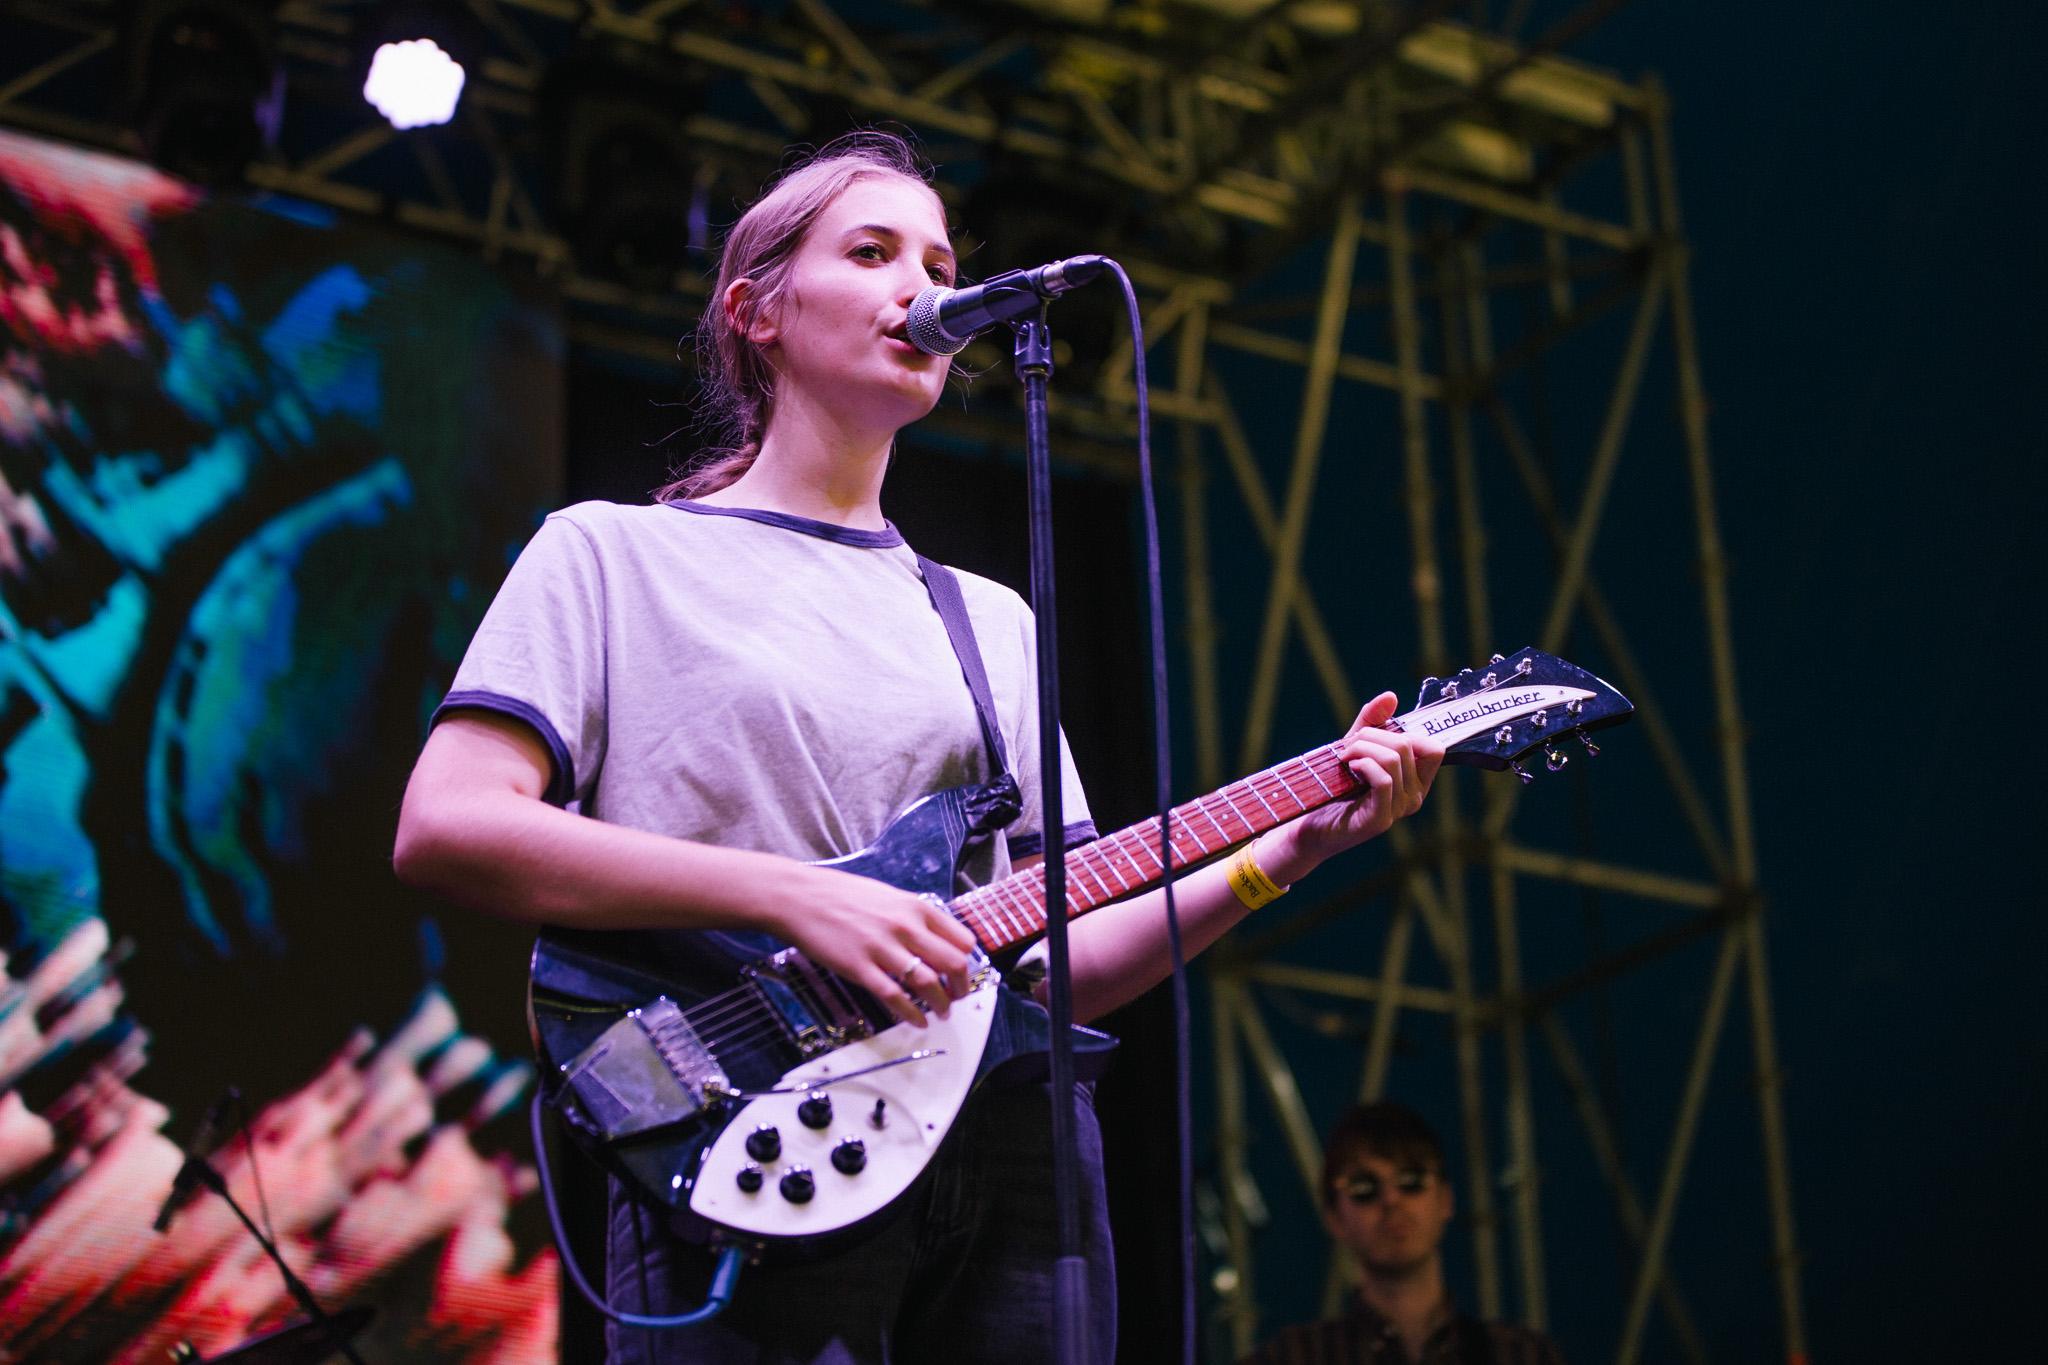 Hatchie_Laneway-Festival-Brisbane-2018_Credit-Bianca-Holderness-3.jpg